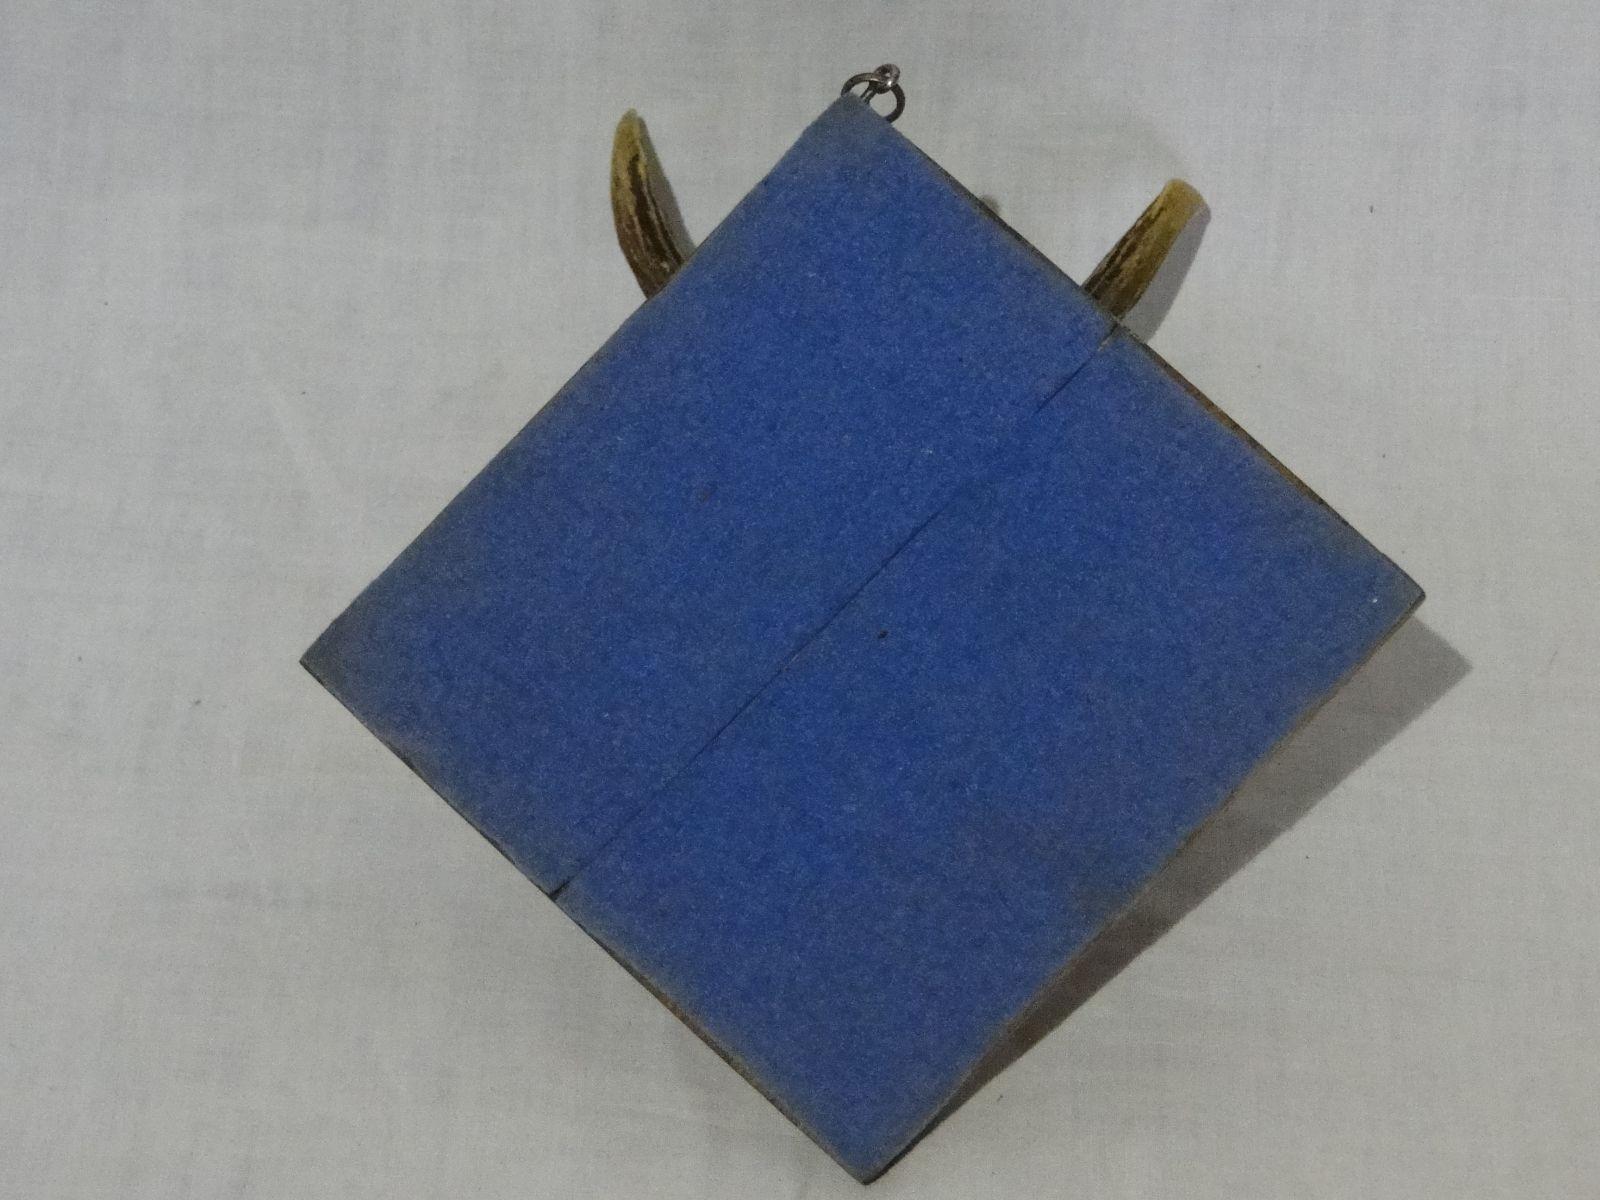 DSC09744.JPG (1600�1200)